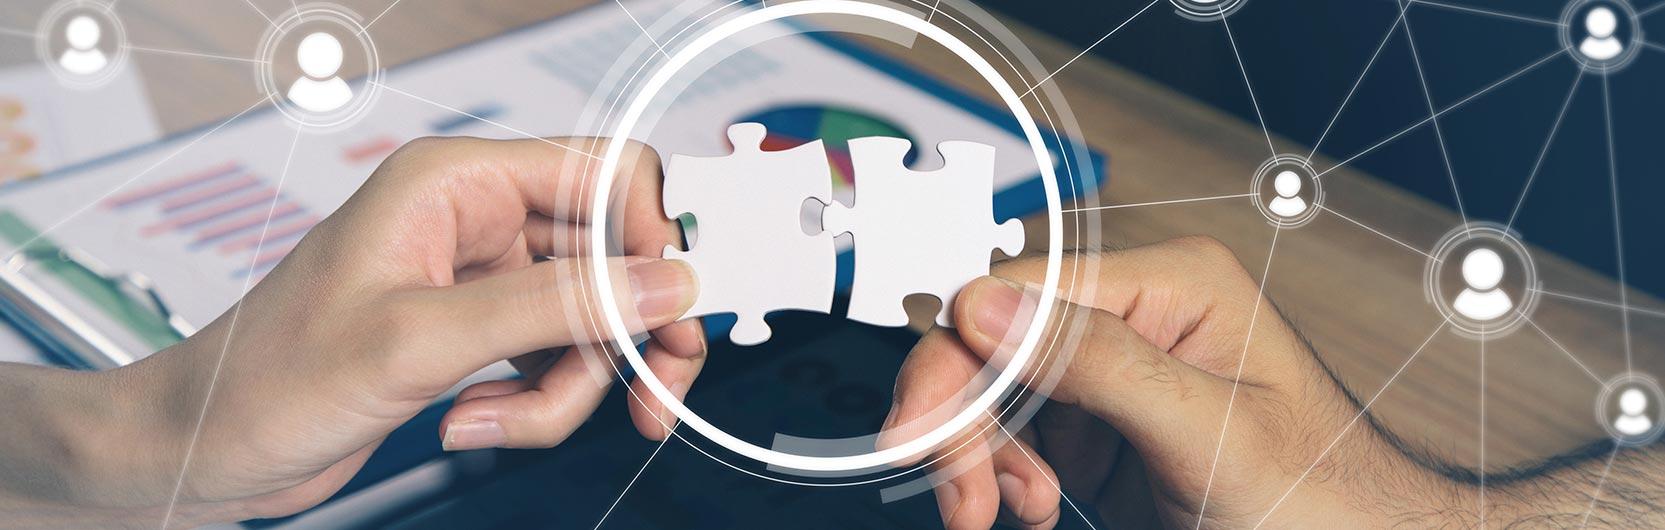 Individual Matchmaking | 5-HT Digital Hub Chemistry & Health